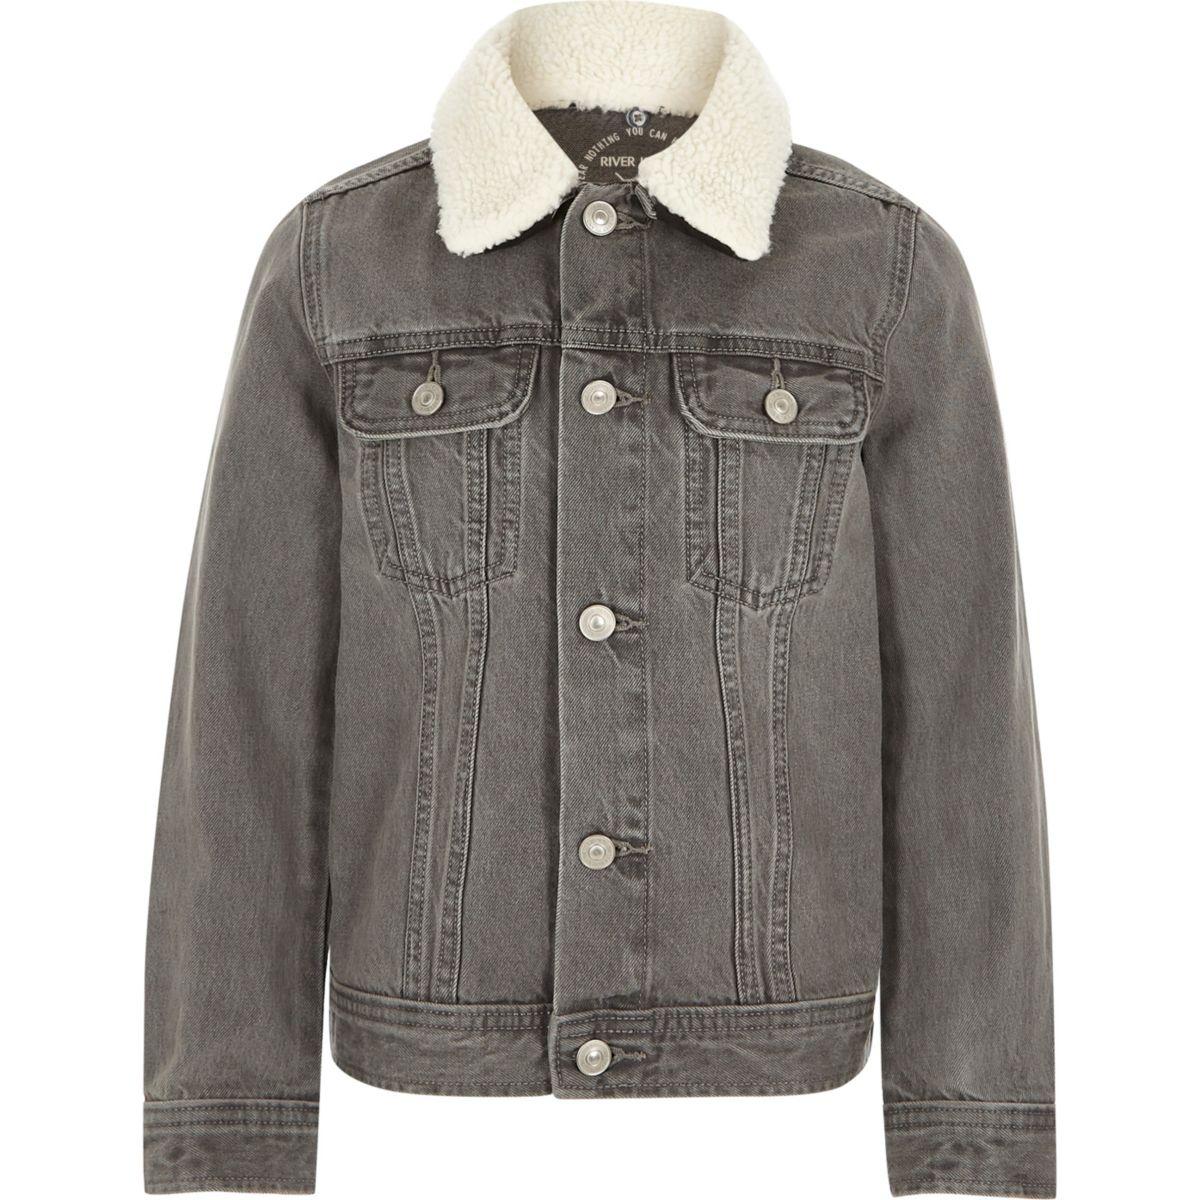 a21ff627085 Star Leather Patched Denim Jacket – Lola and the boys. Boys grey borg  collar denim jacket